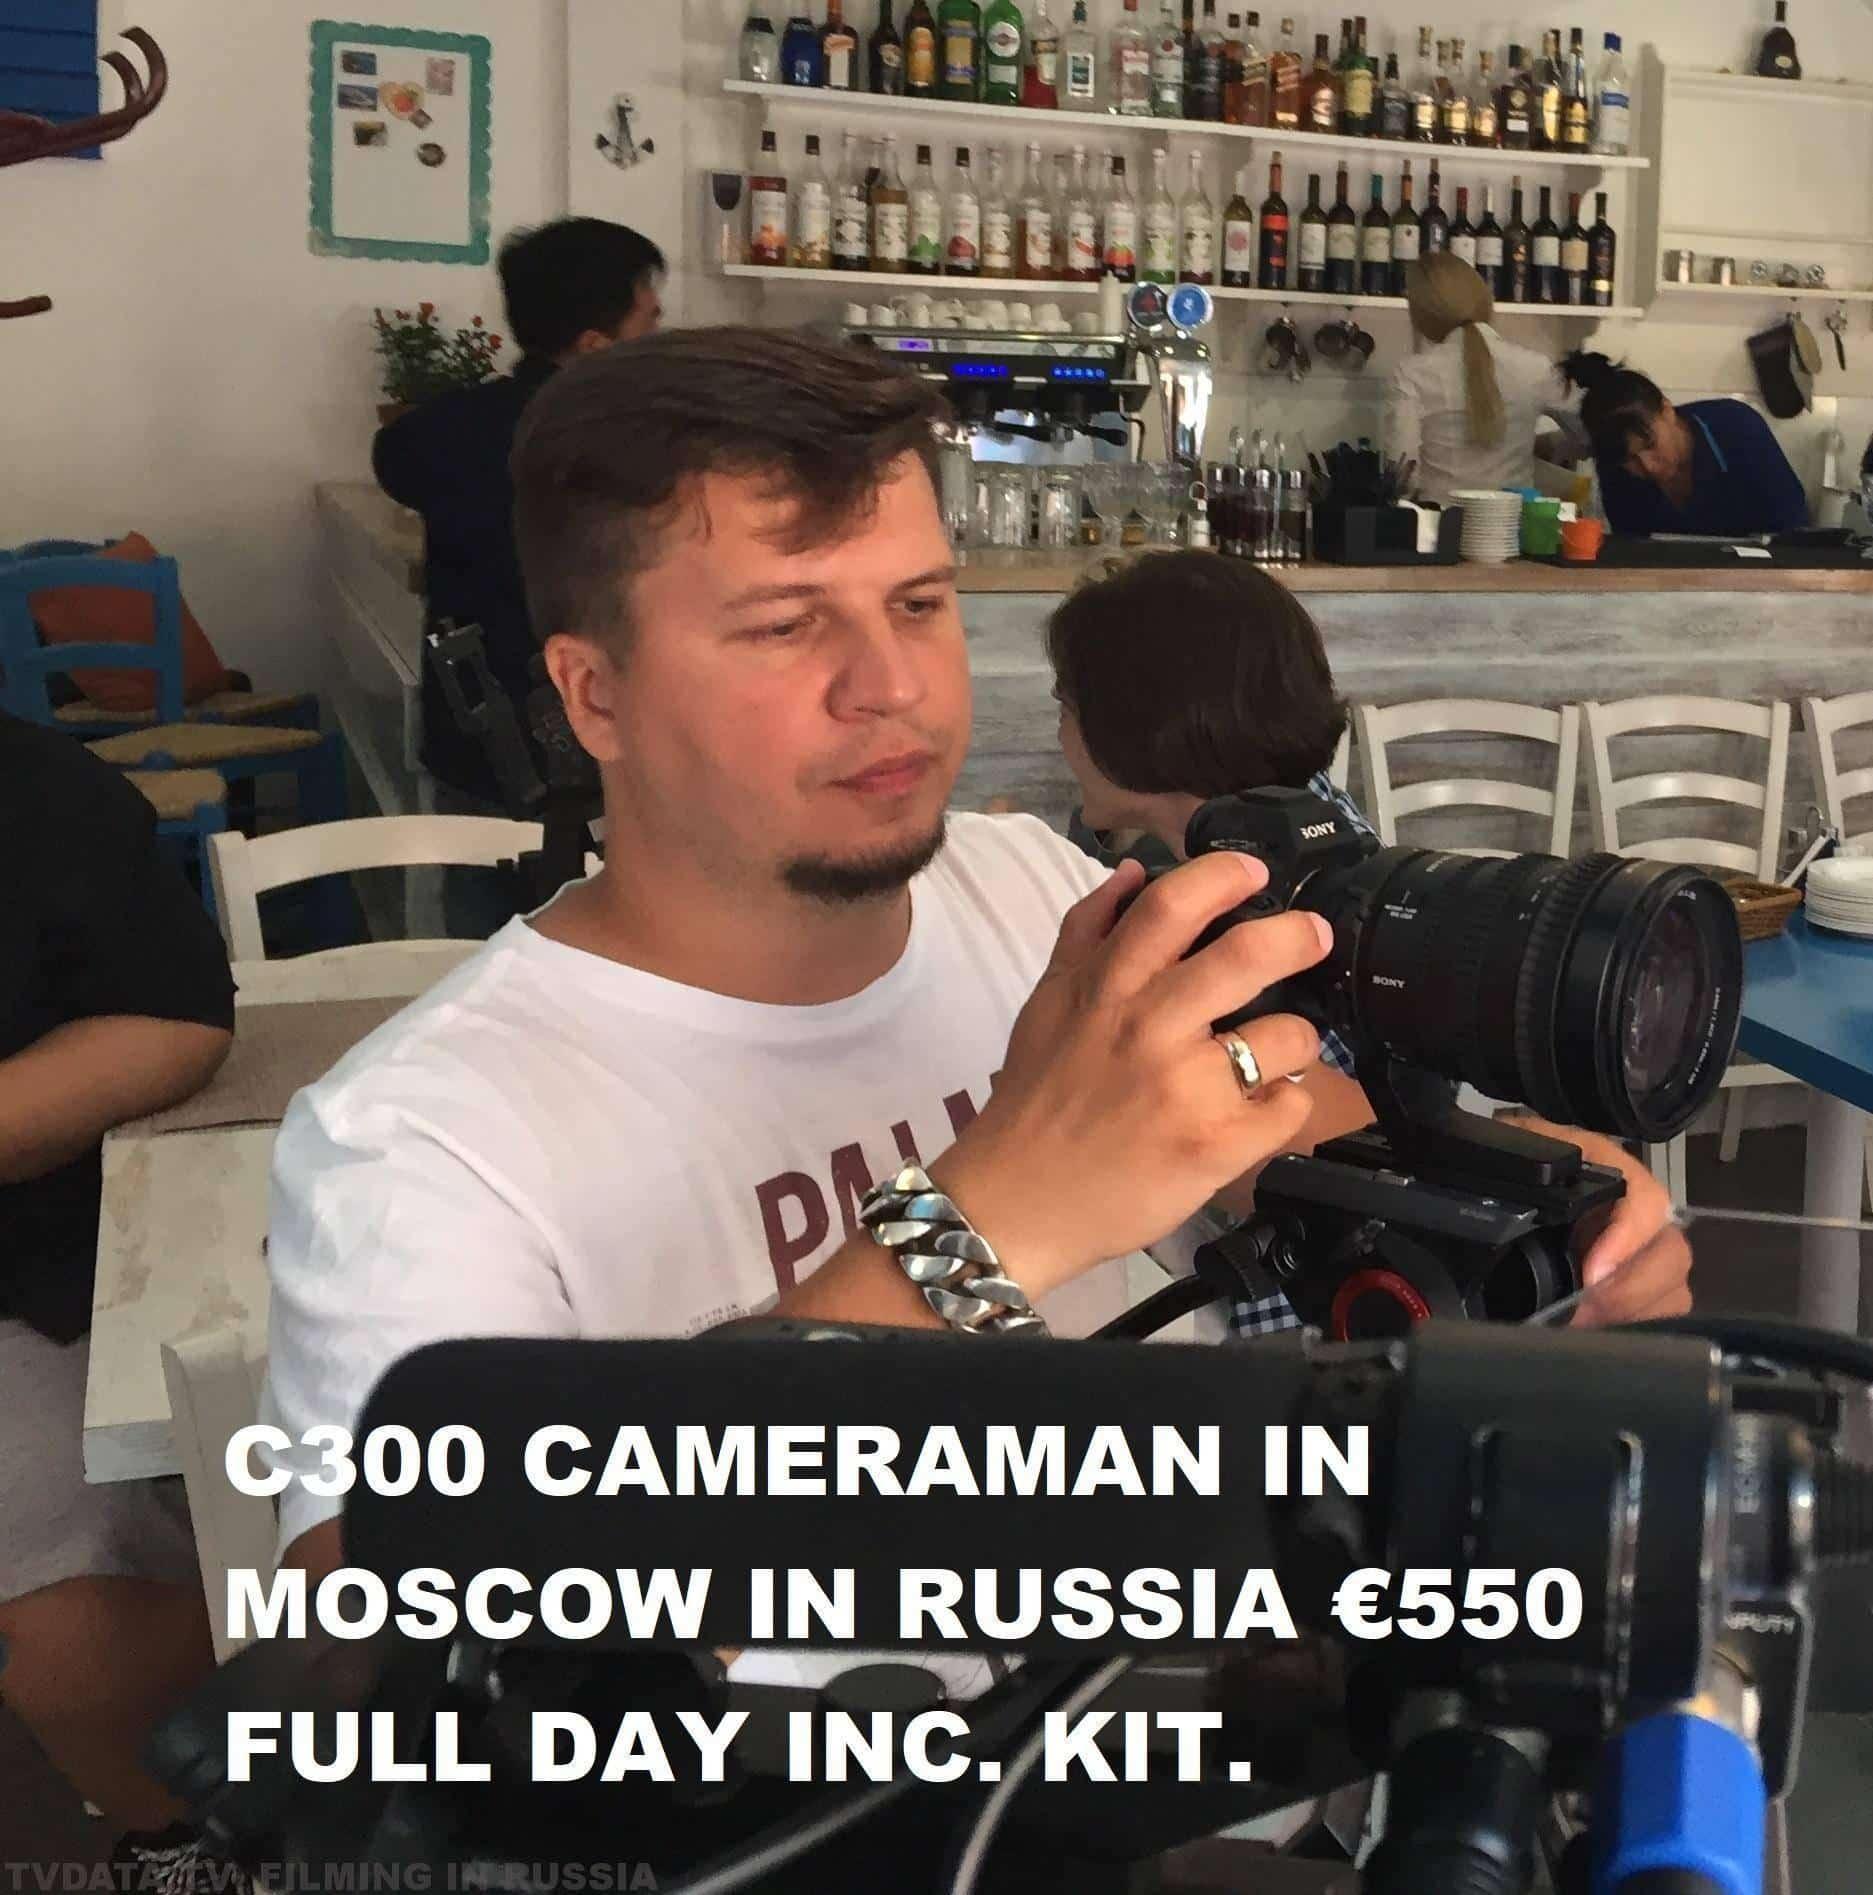 C 300 CAMERAMAN IN MOSCOW IN RUSSIA €650 FULL DAY INC. KIT. CAMERAMAN@TVDATA.TV